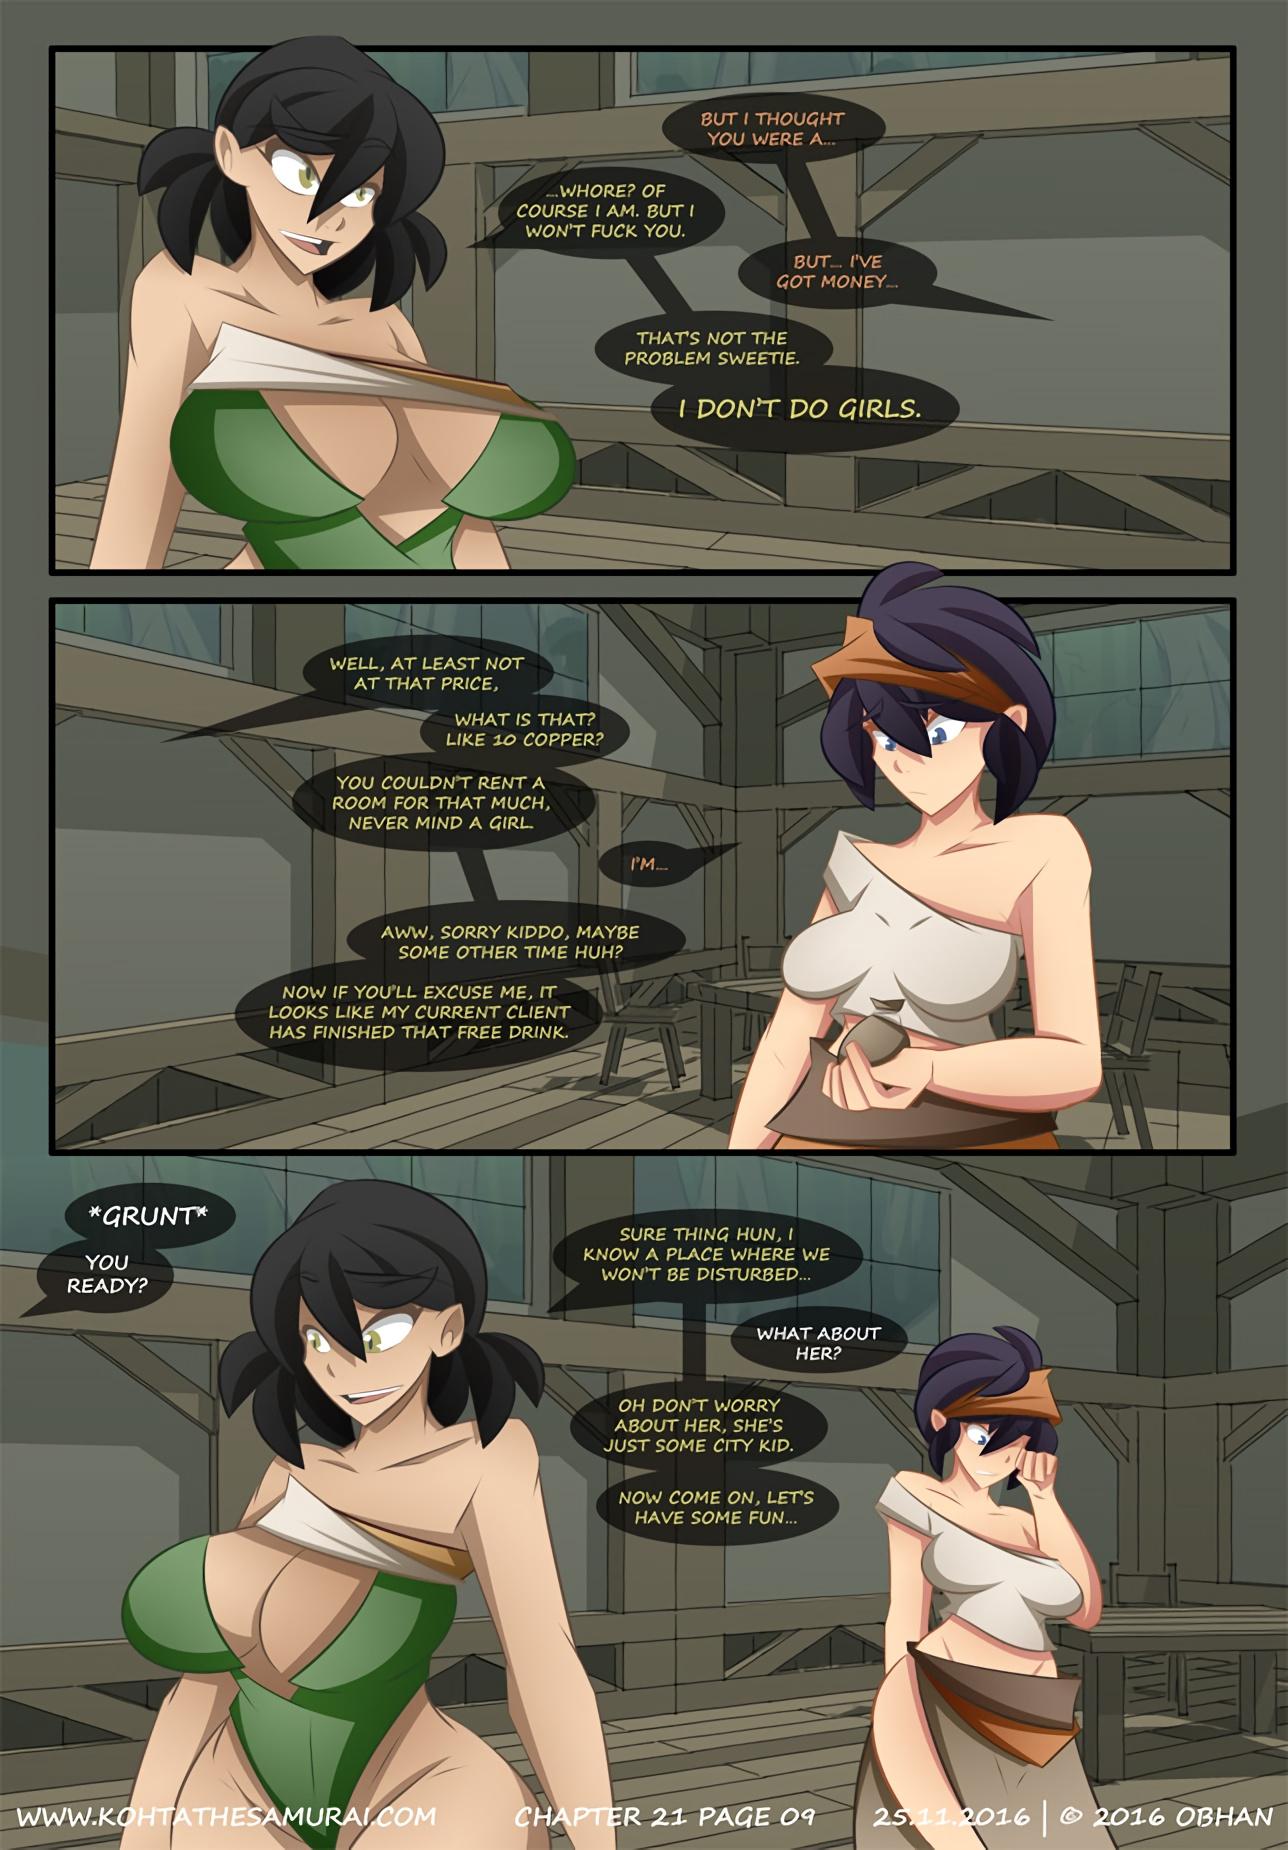 Kohta The Samurai 21-25 porn comics Big Tits, Blowjob, Cum Shots, cunnilingus, Elf, Fantasy, fingering, Lesbians, Masturbation, Oral sex, Straight, Threesome